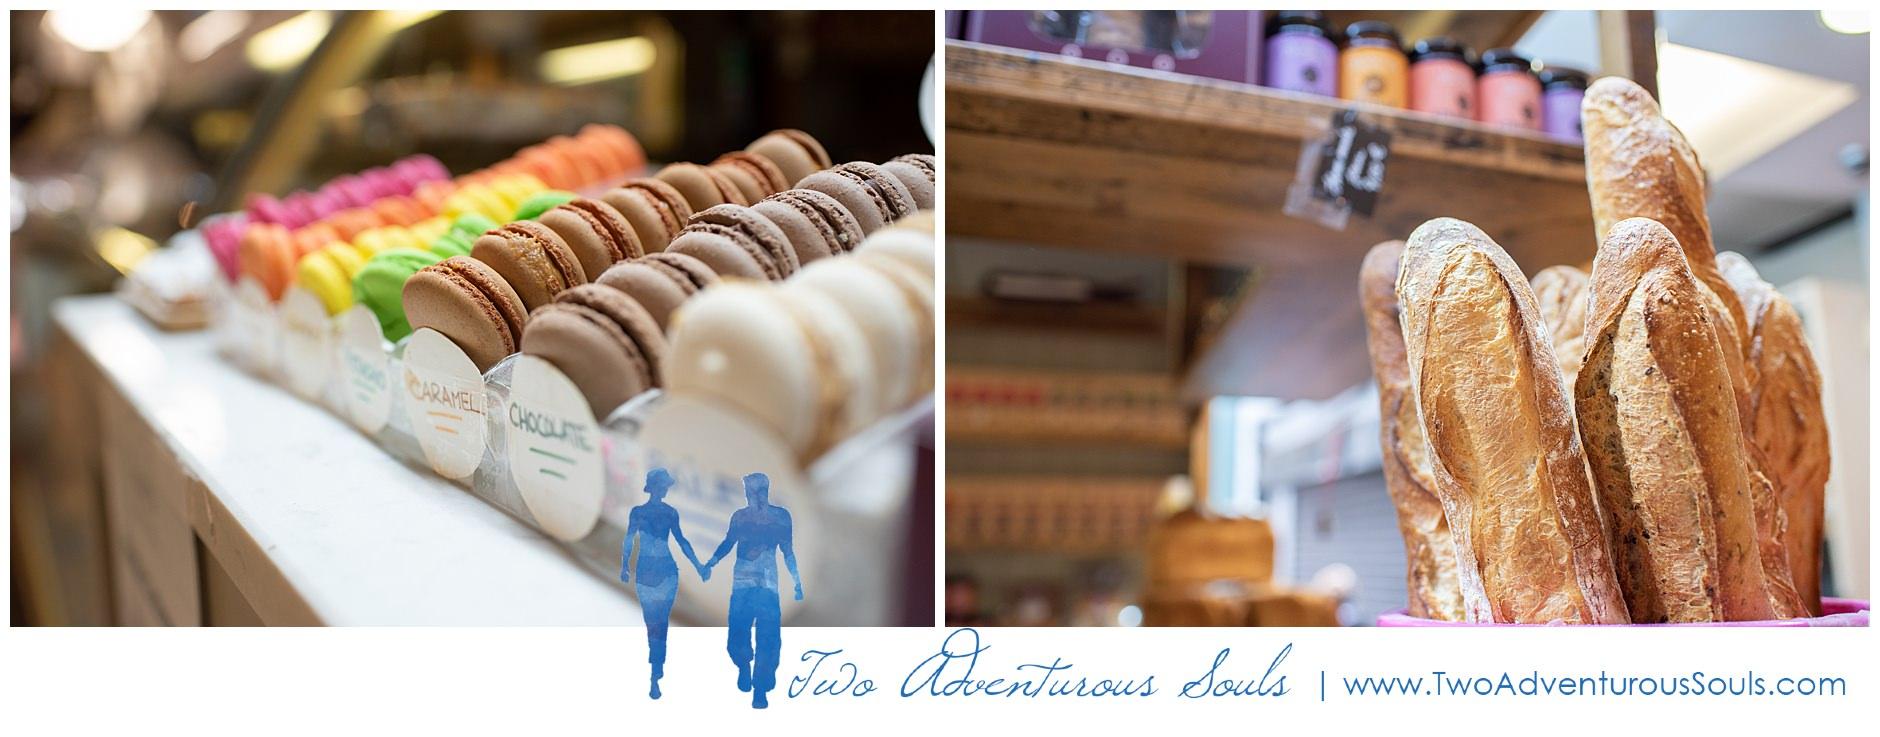 Destination Wedding Photographers, Ireland Photographers, Two Adventurous Souls- CasheltoCork_0006.jpg